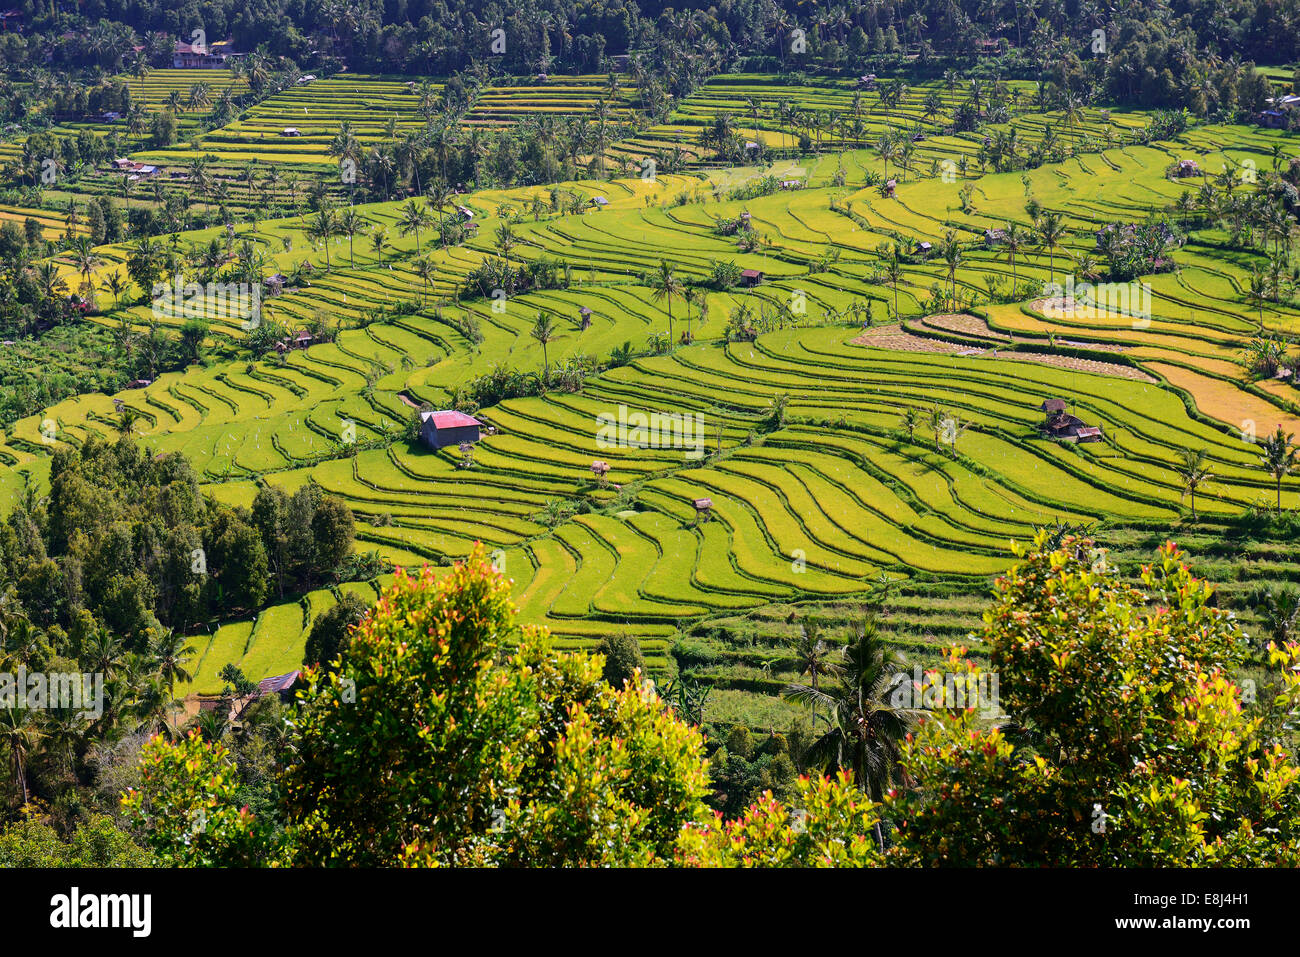 Rice paddies and rice terraces, Munduk, Central Bali, Bali, Indonesia - Stock Image